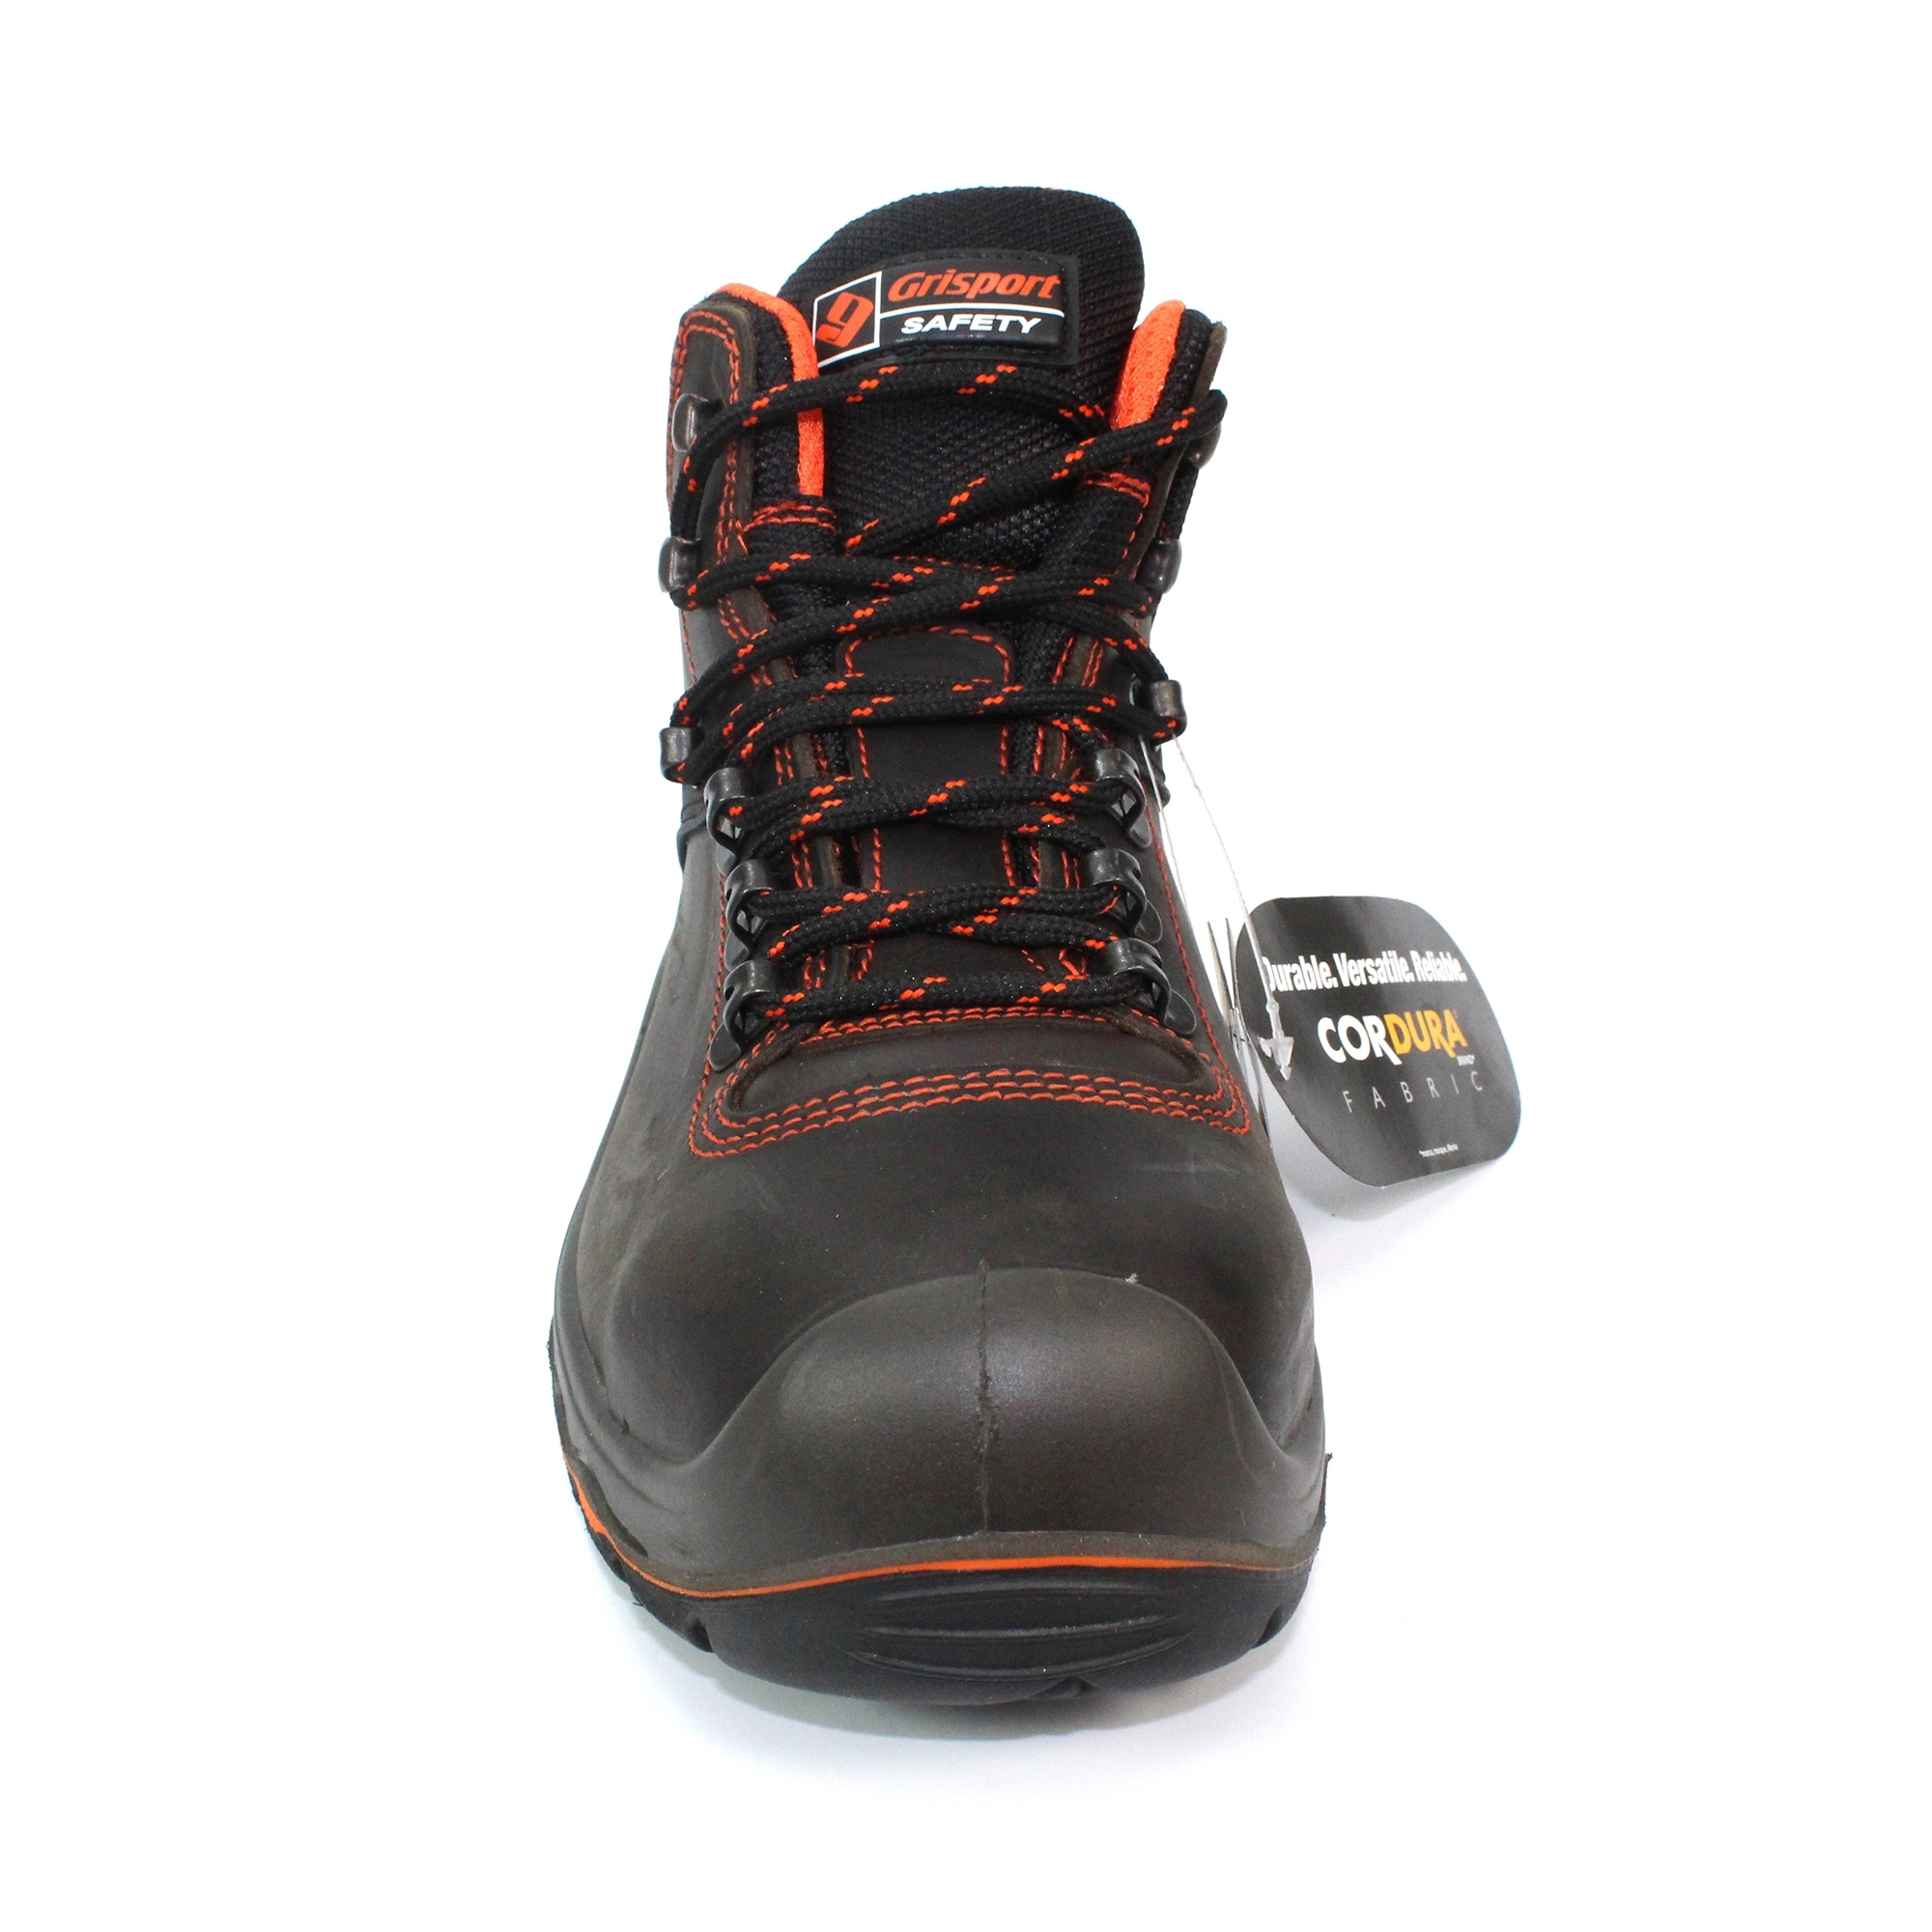 775c1ea7518 Gri Sport Hammer S3 Safety Boot - charliekeenan.com